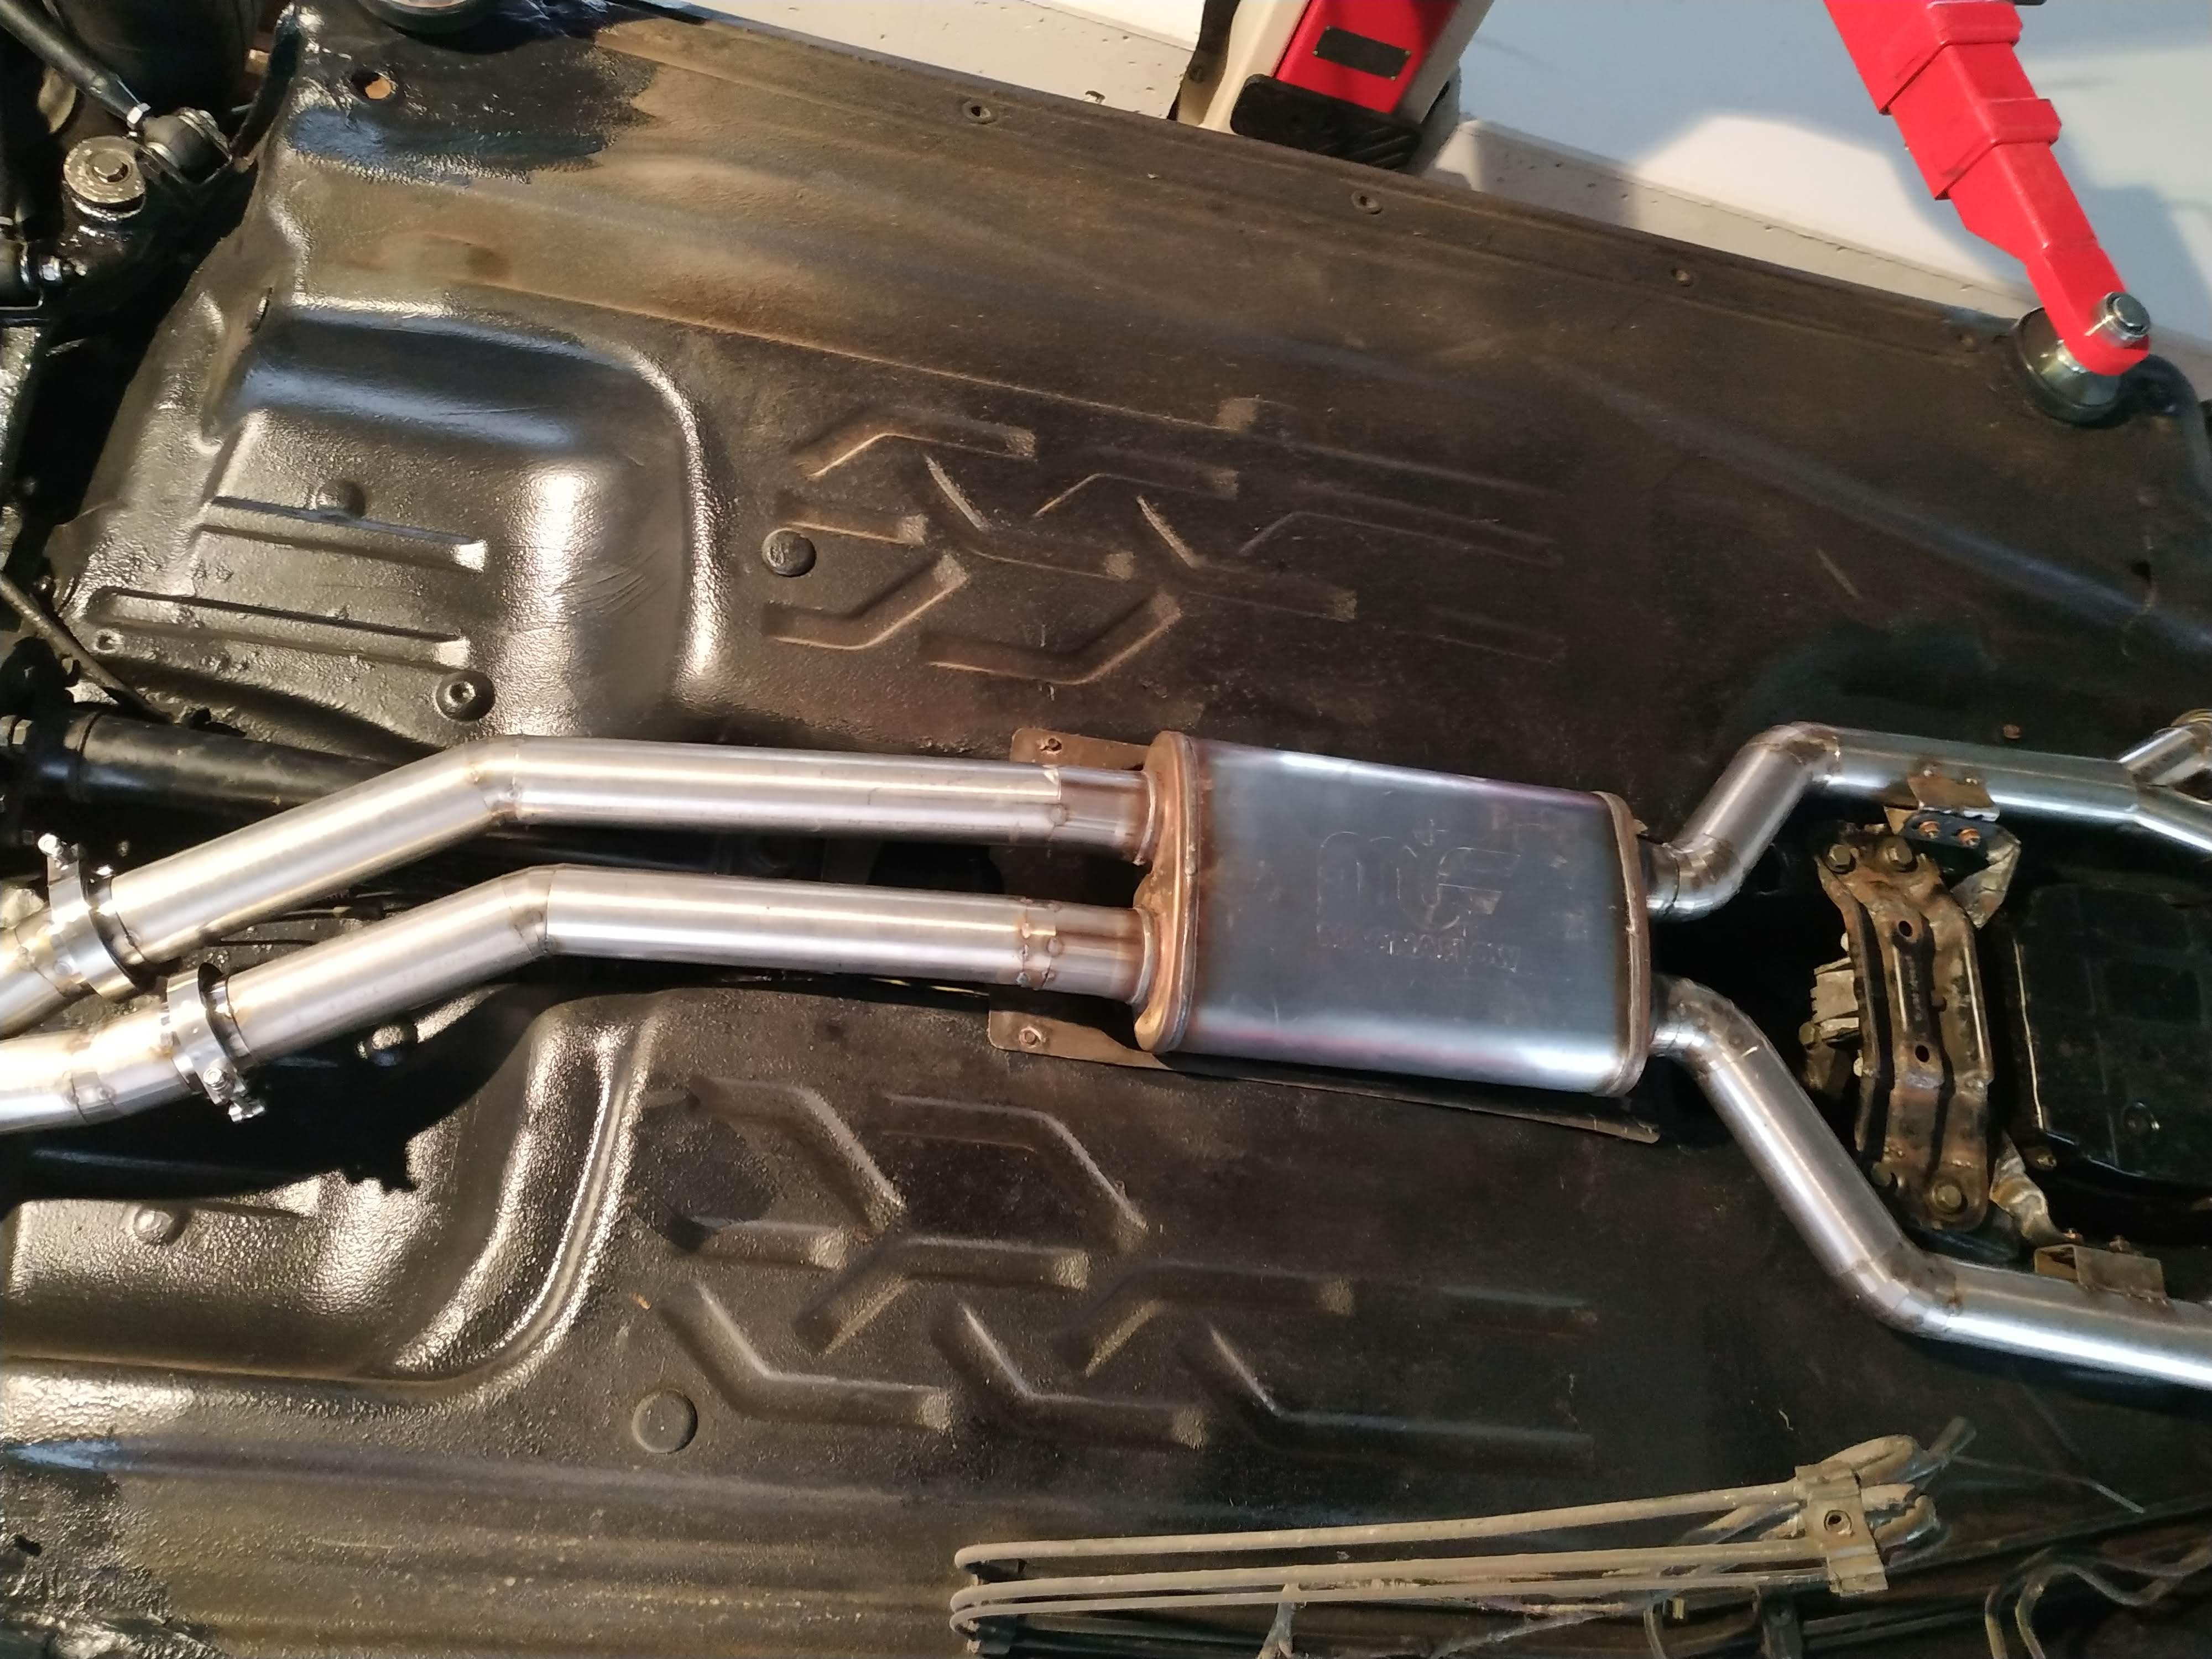 Custom Exhaust Build For W201 V12 Engine Swap 3